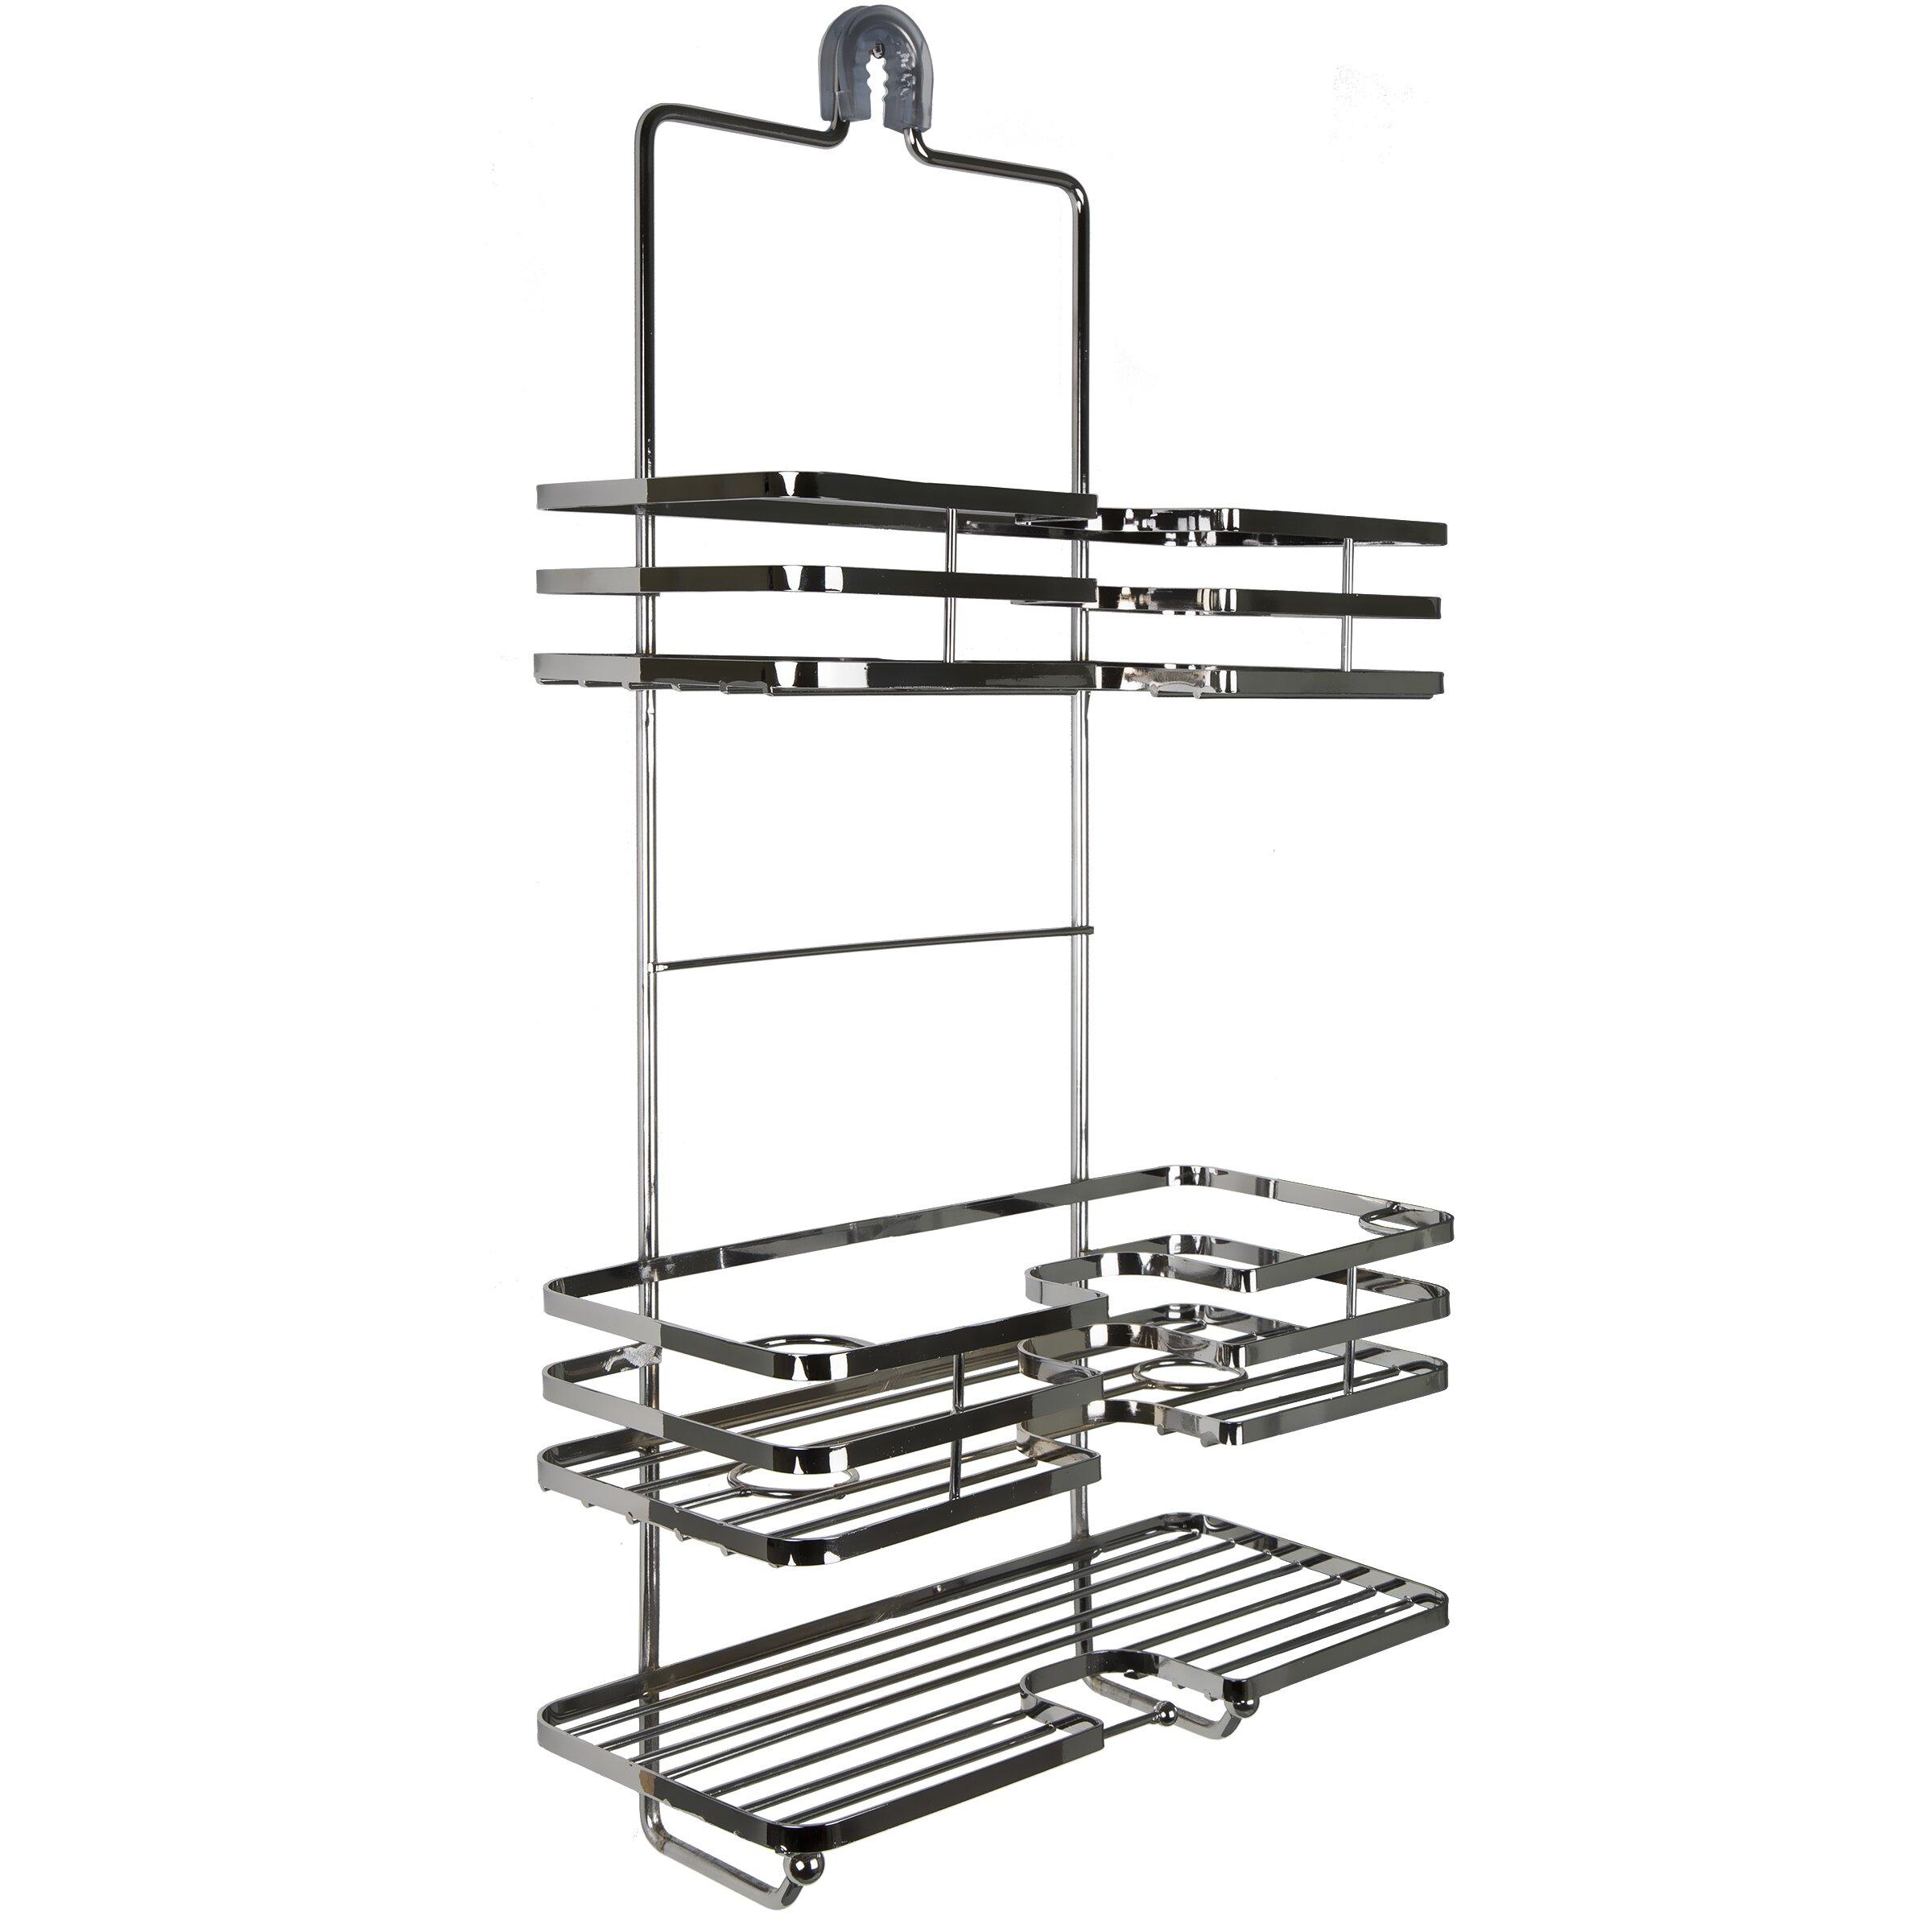 hanging bathroom shower caddy | My Web Value